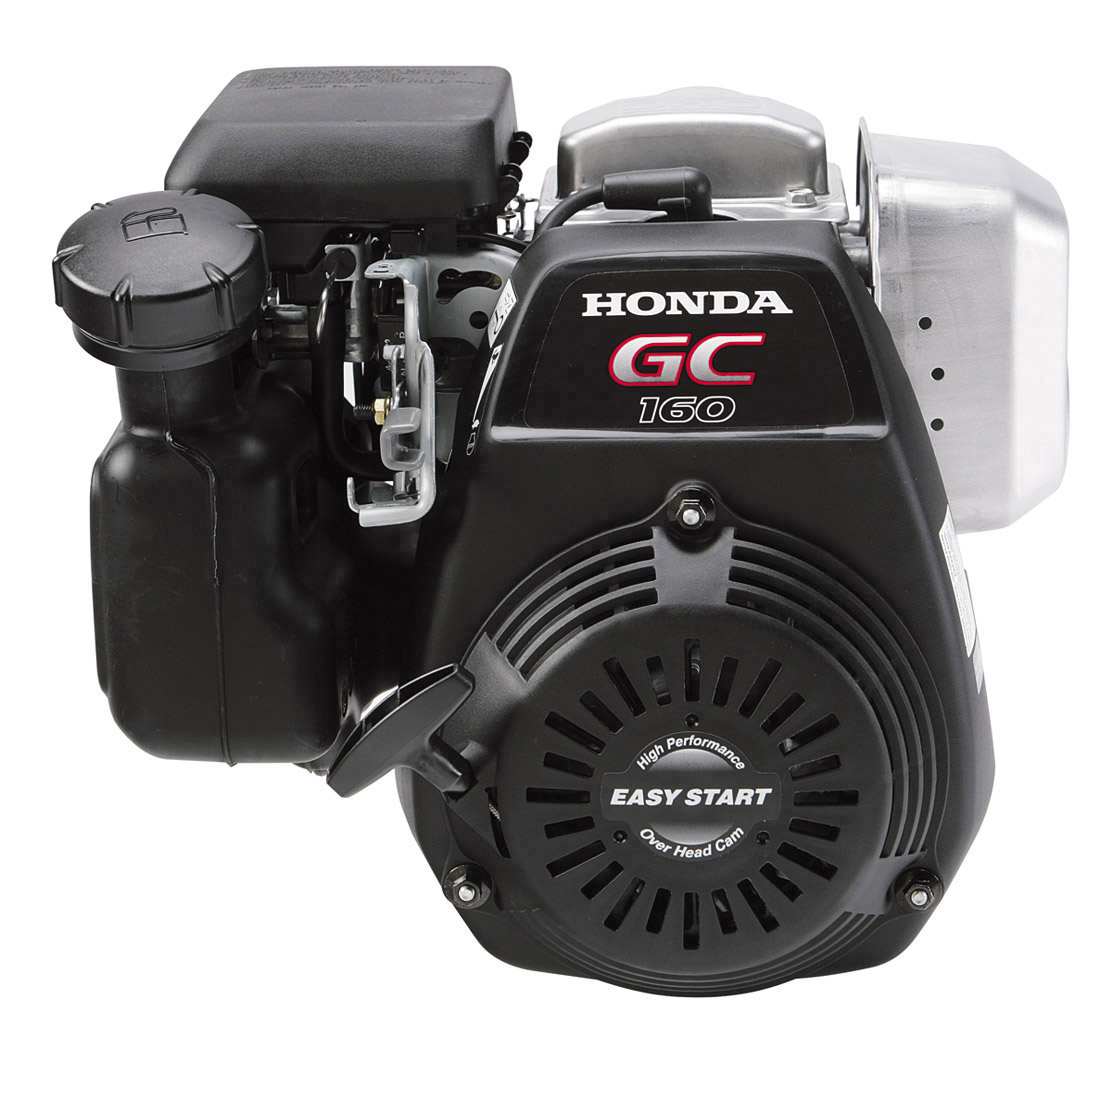 Honda Engines Gc160 4 Stroke Engine Features Specs And Model Info Carburetor Diagram 190